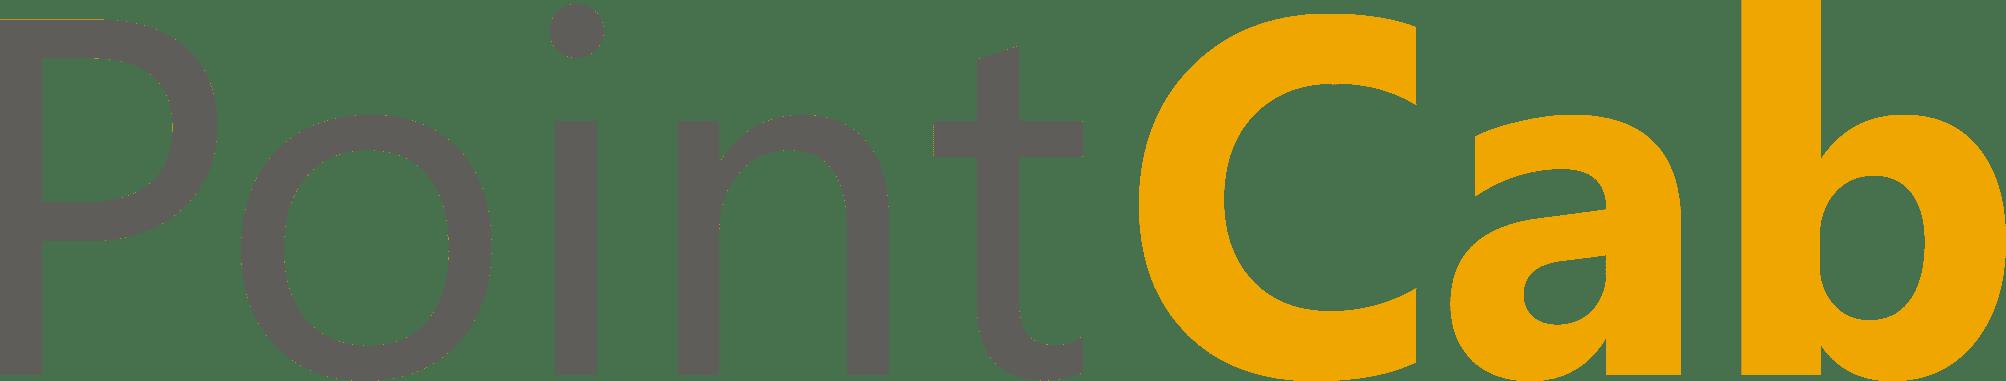 partner logo 2 - Unsere Partner